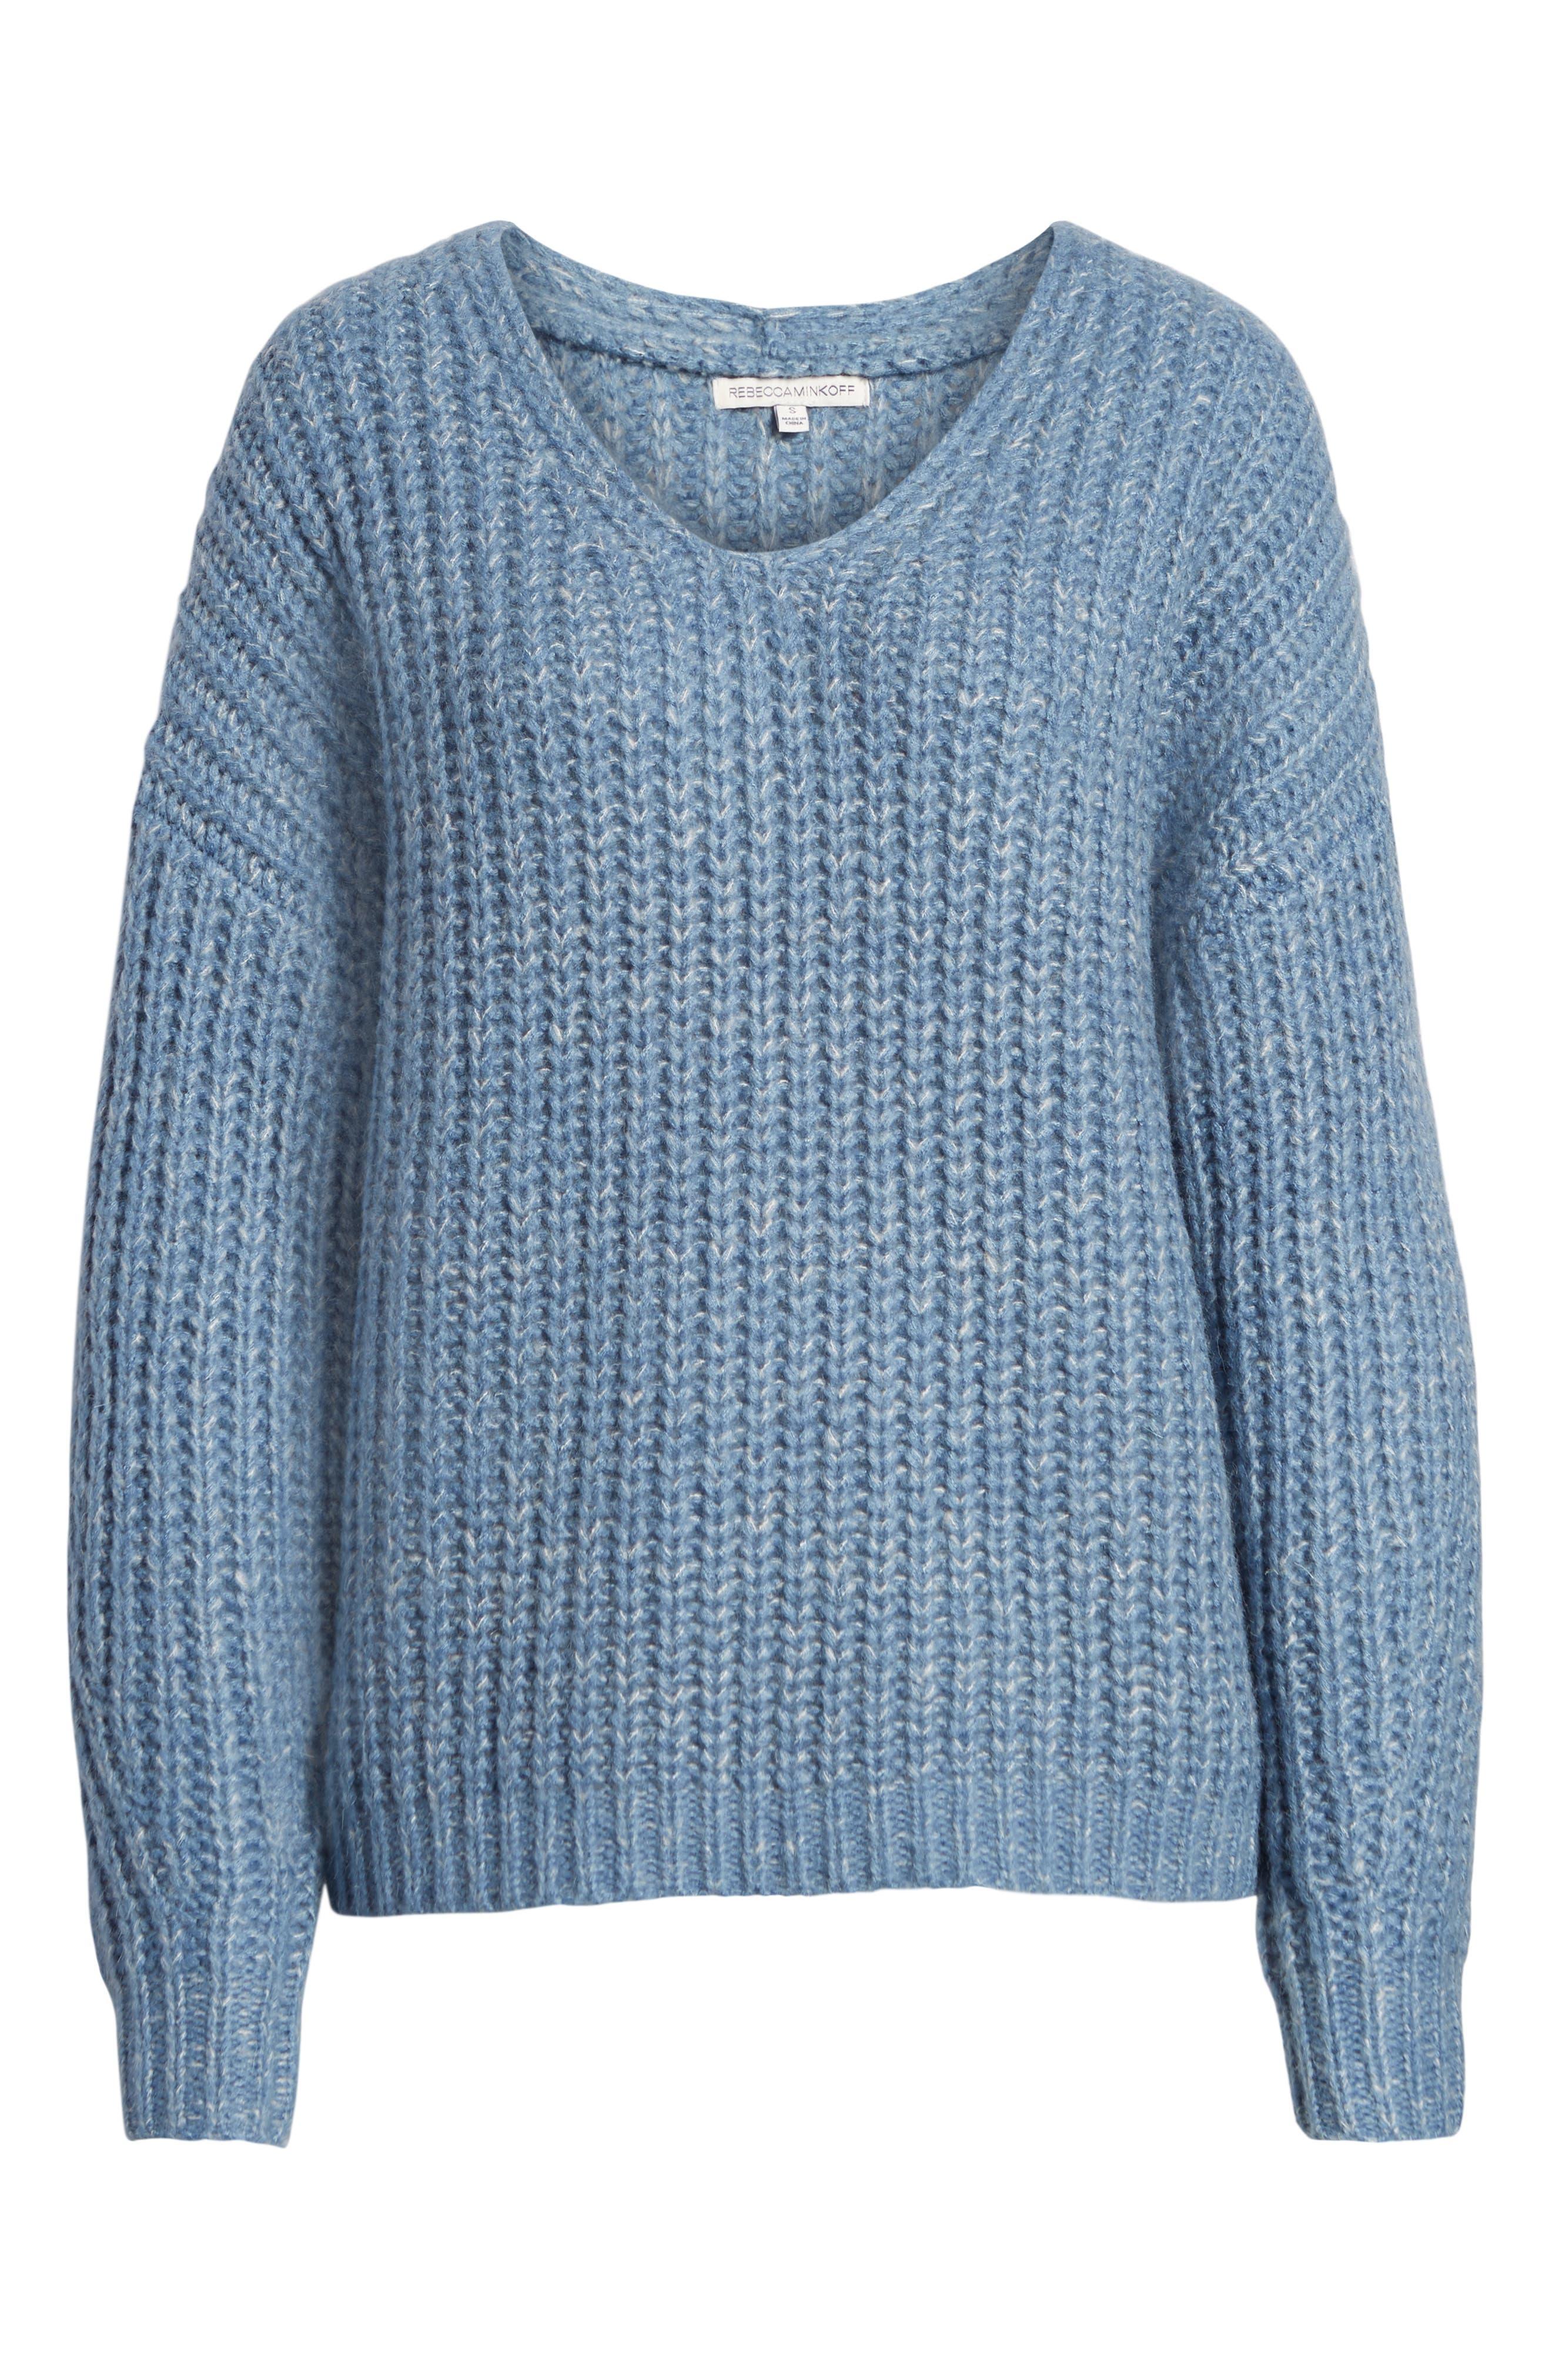 Dorit Sweater,                             Alternate thumbnail 6, color,                             BLUE